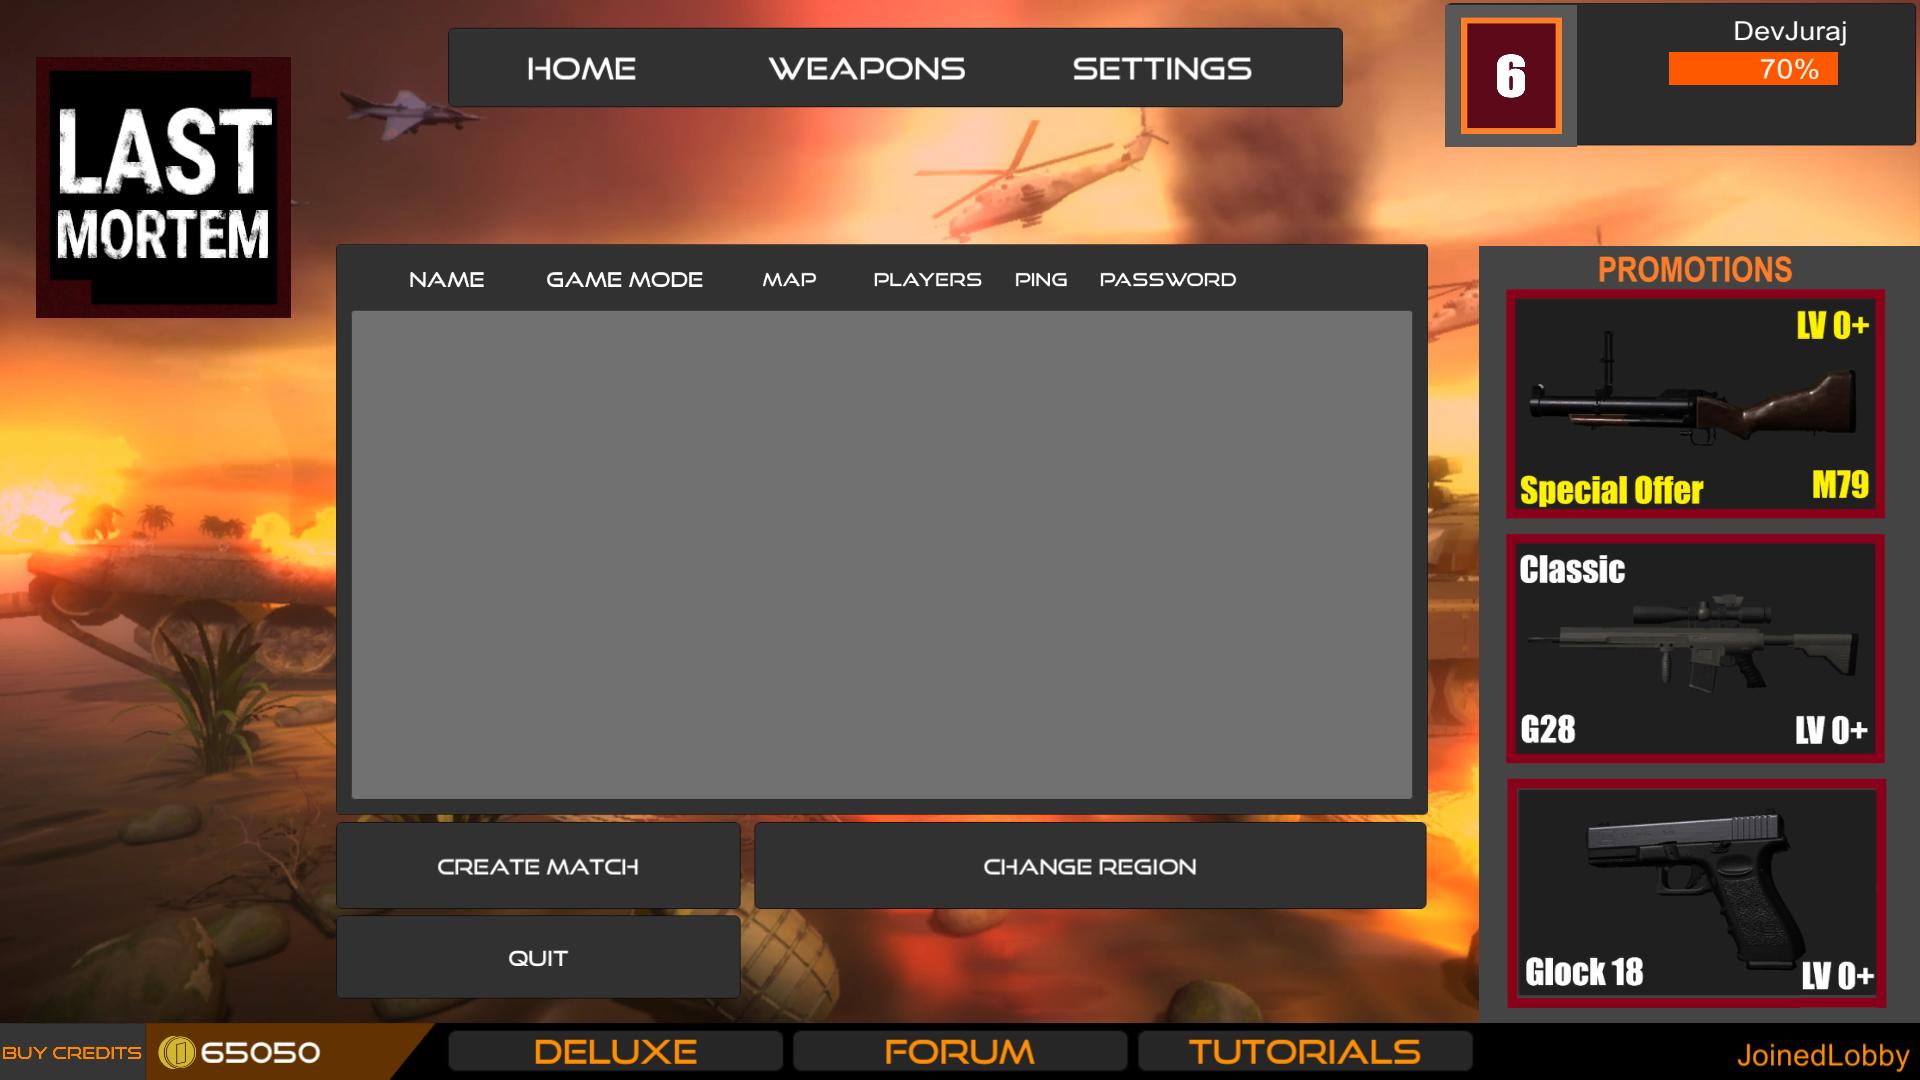 Updated Main Menu UI with Credits